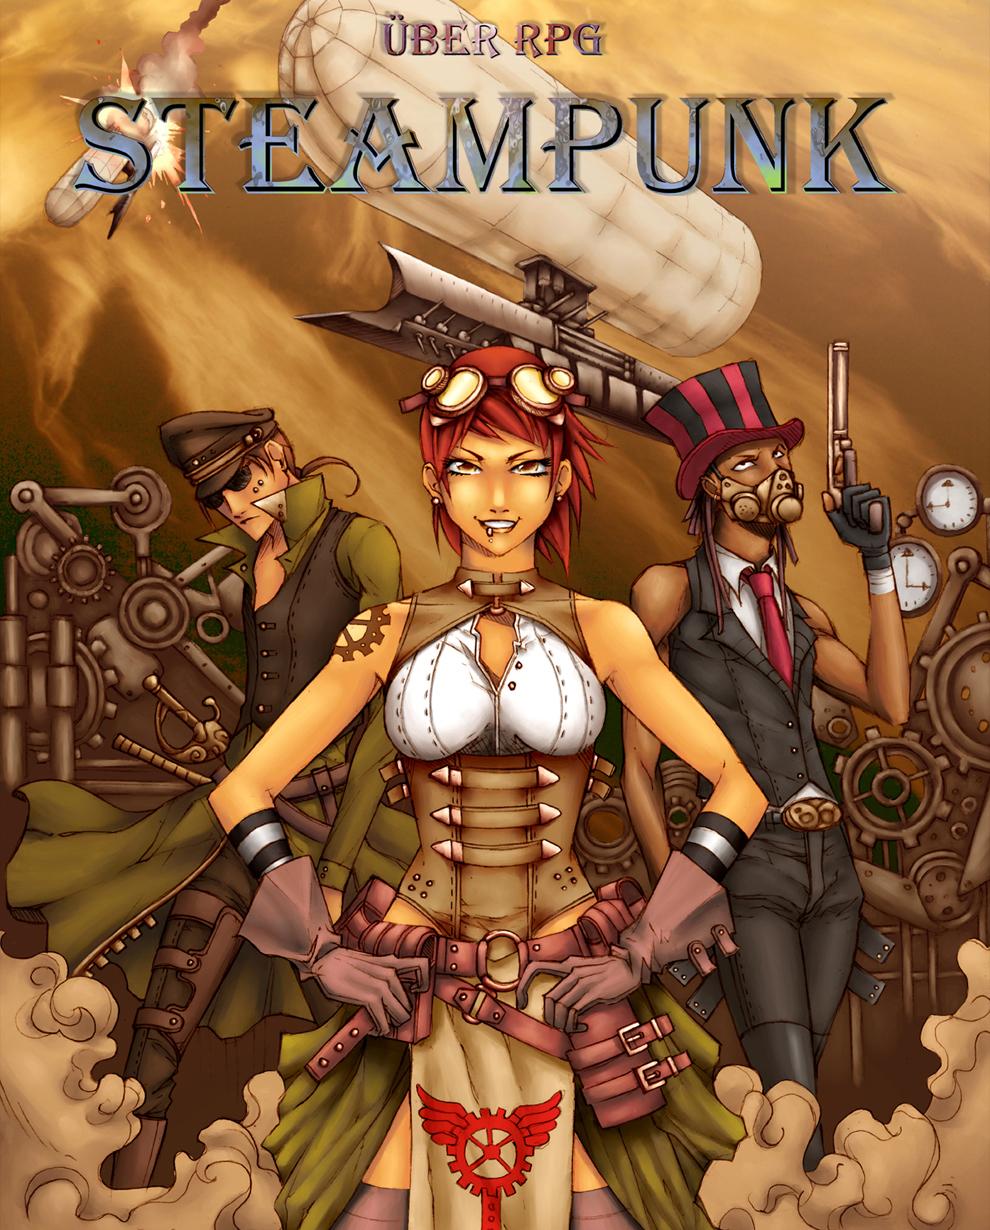 SteampunkRPG.com